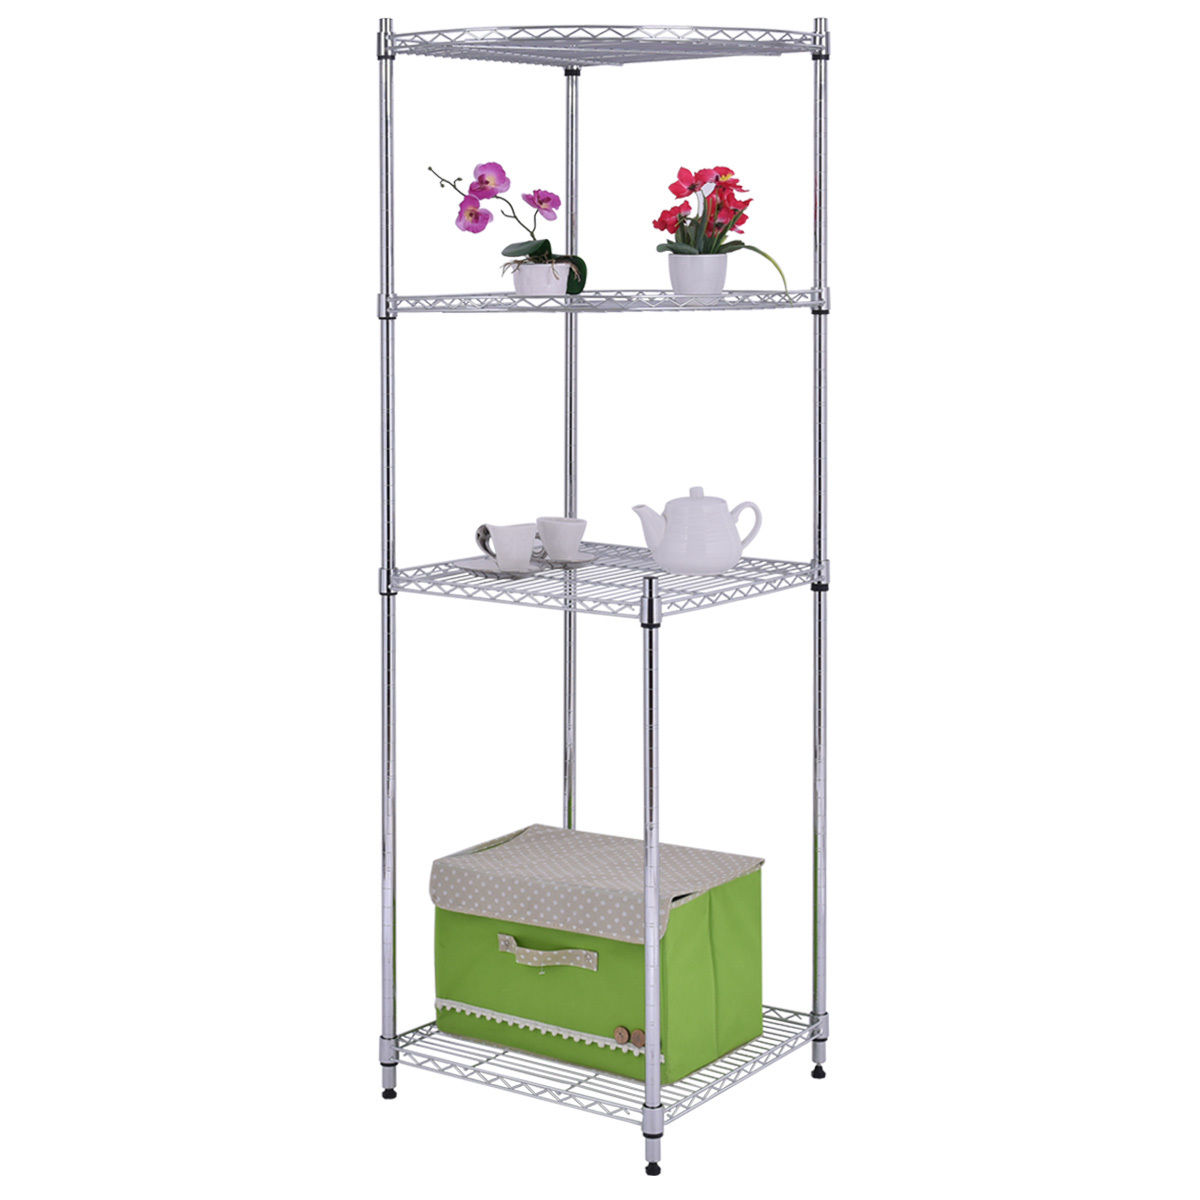 Goplus 4 Tier Coner Shelf Storage Rack Home Office